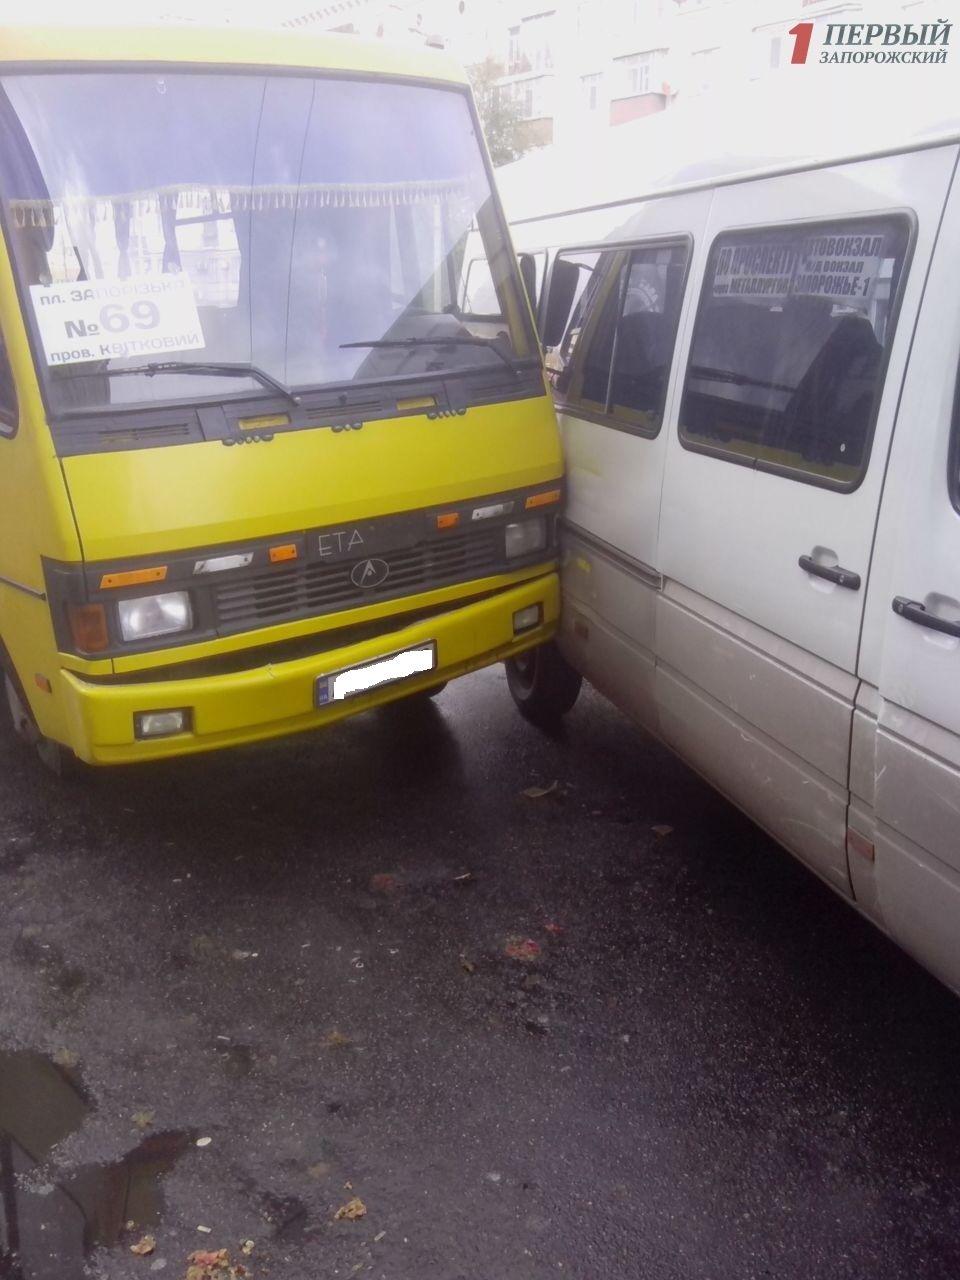 В центре Запорожья столкнулись две маршрутки с пассажирами, - ФОТО, фото-2